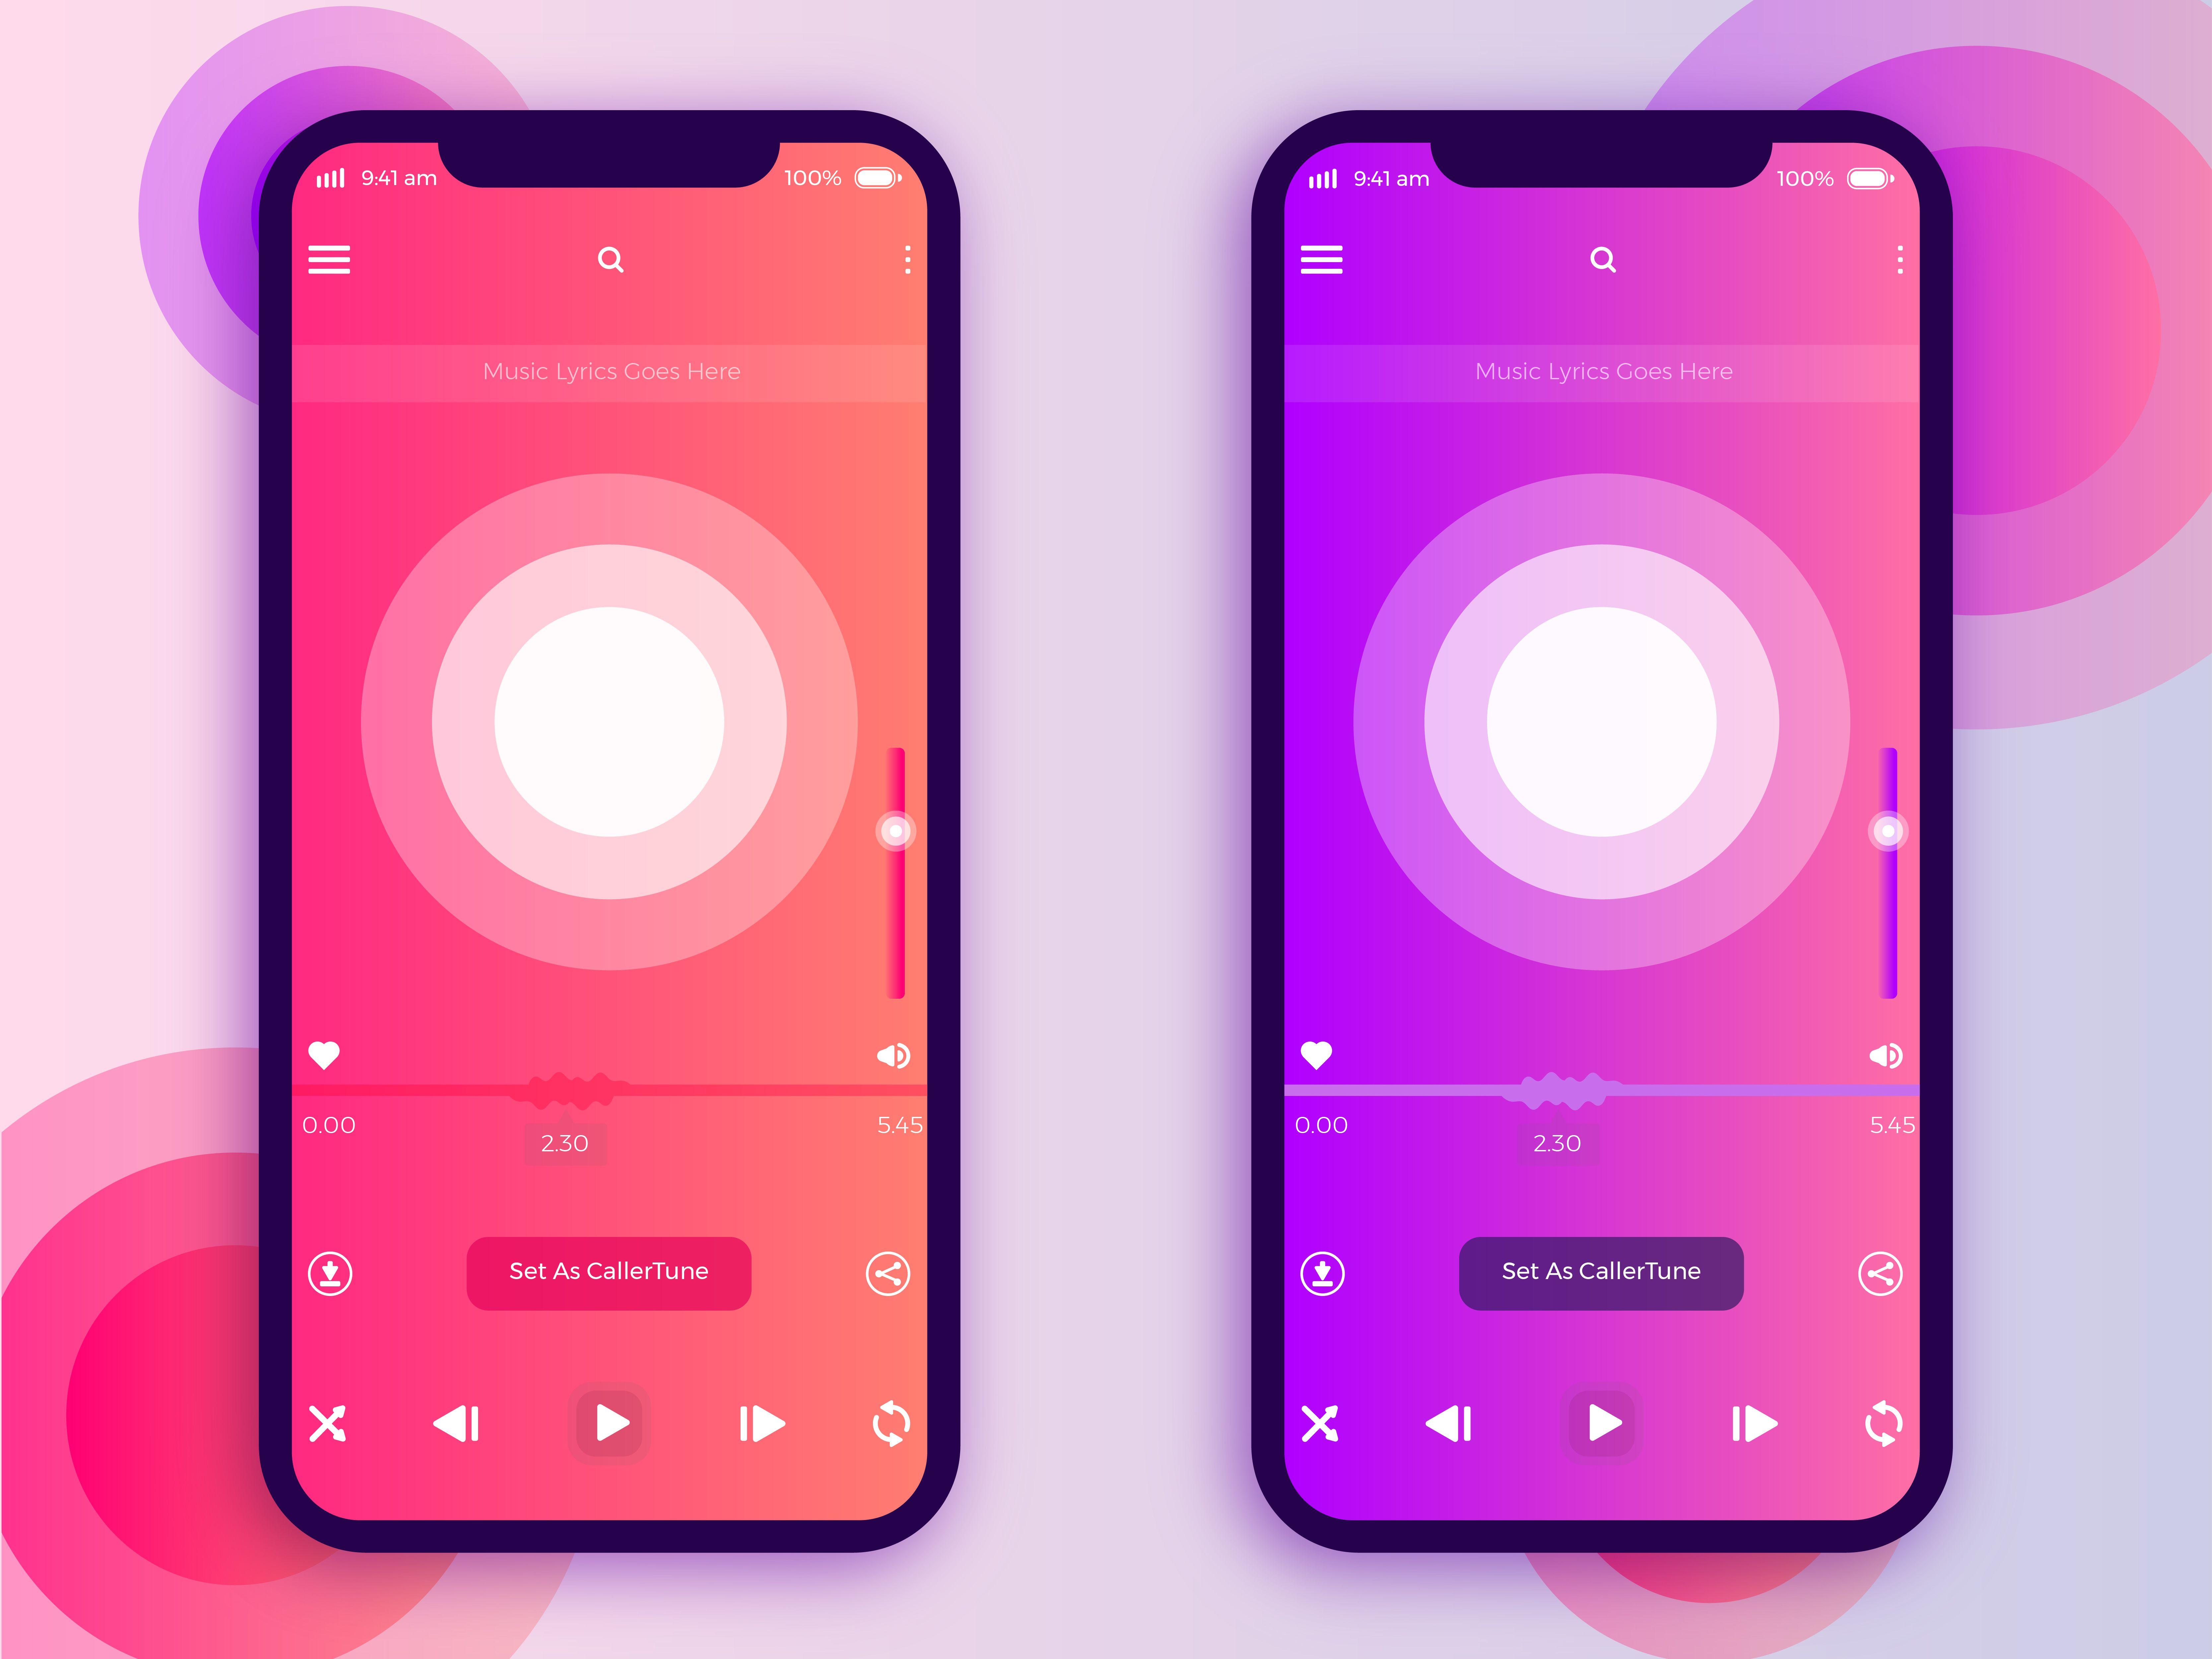 Music App UIX Design Color App design inspiration